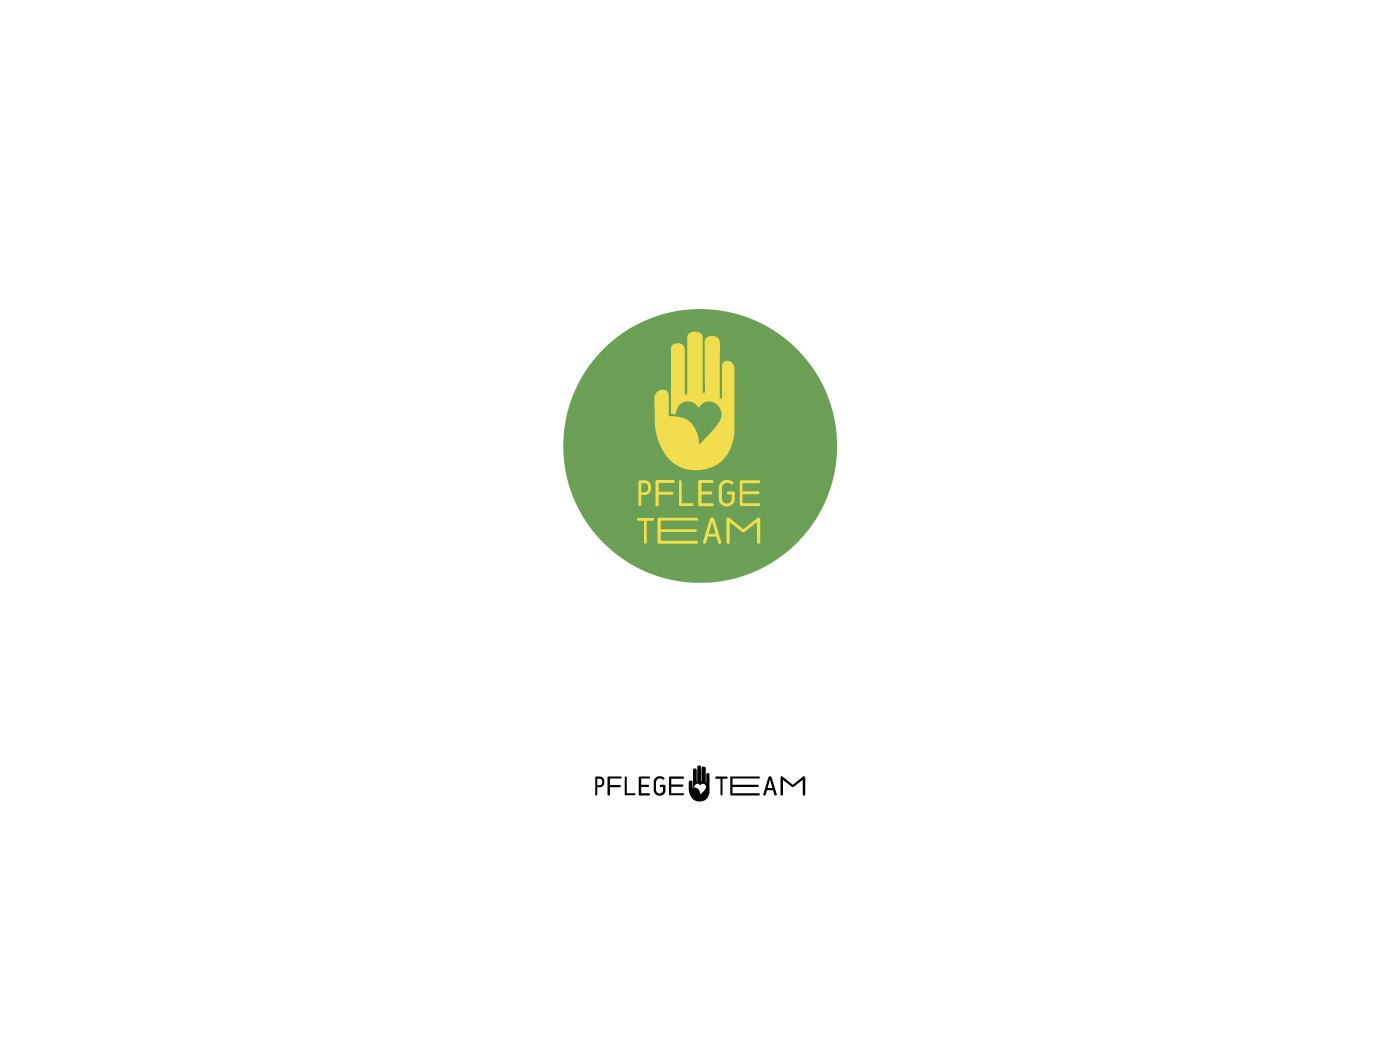 pflegeteam_logo_grafik_design_marina_marina_db_augsburg